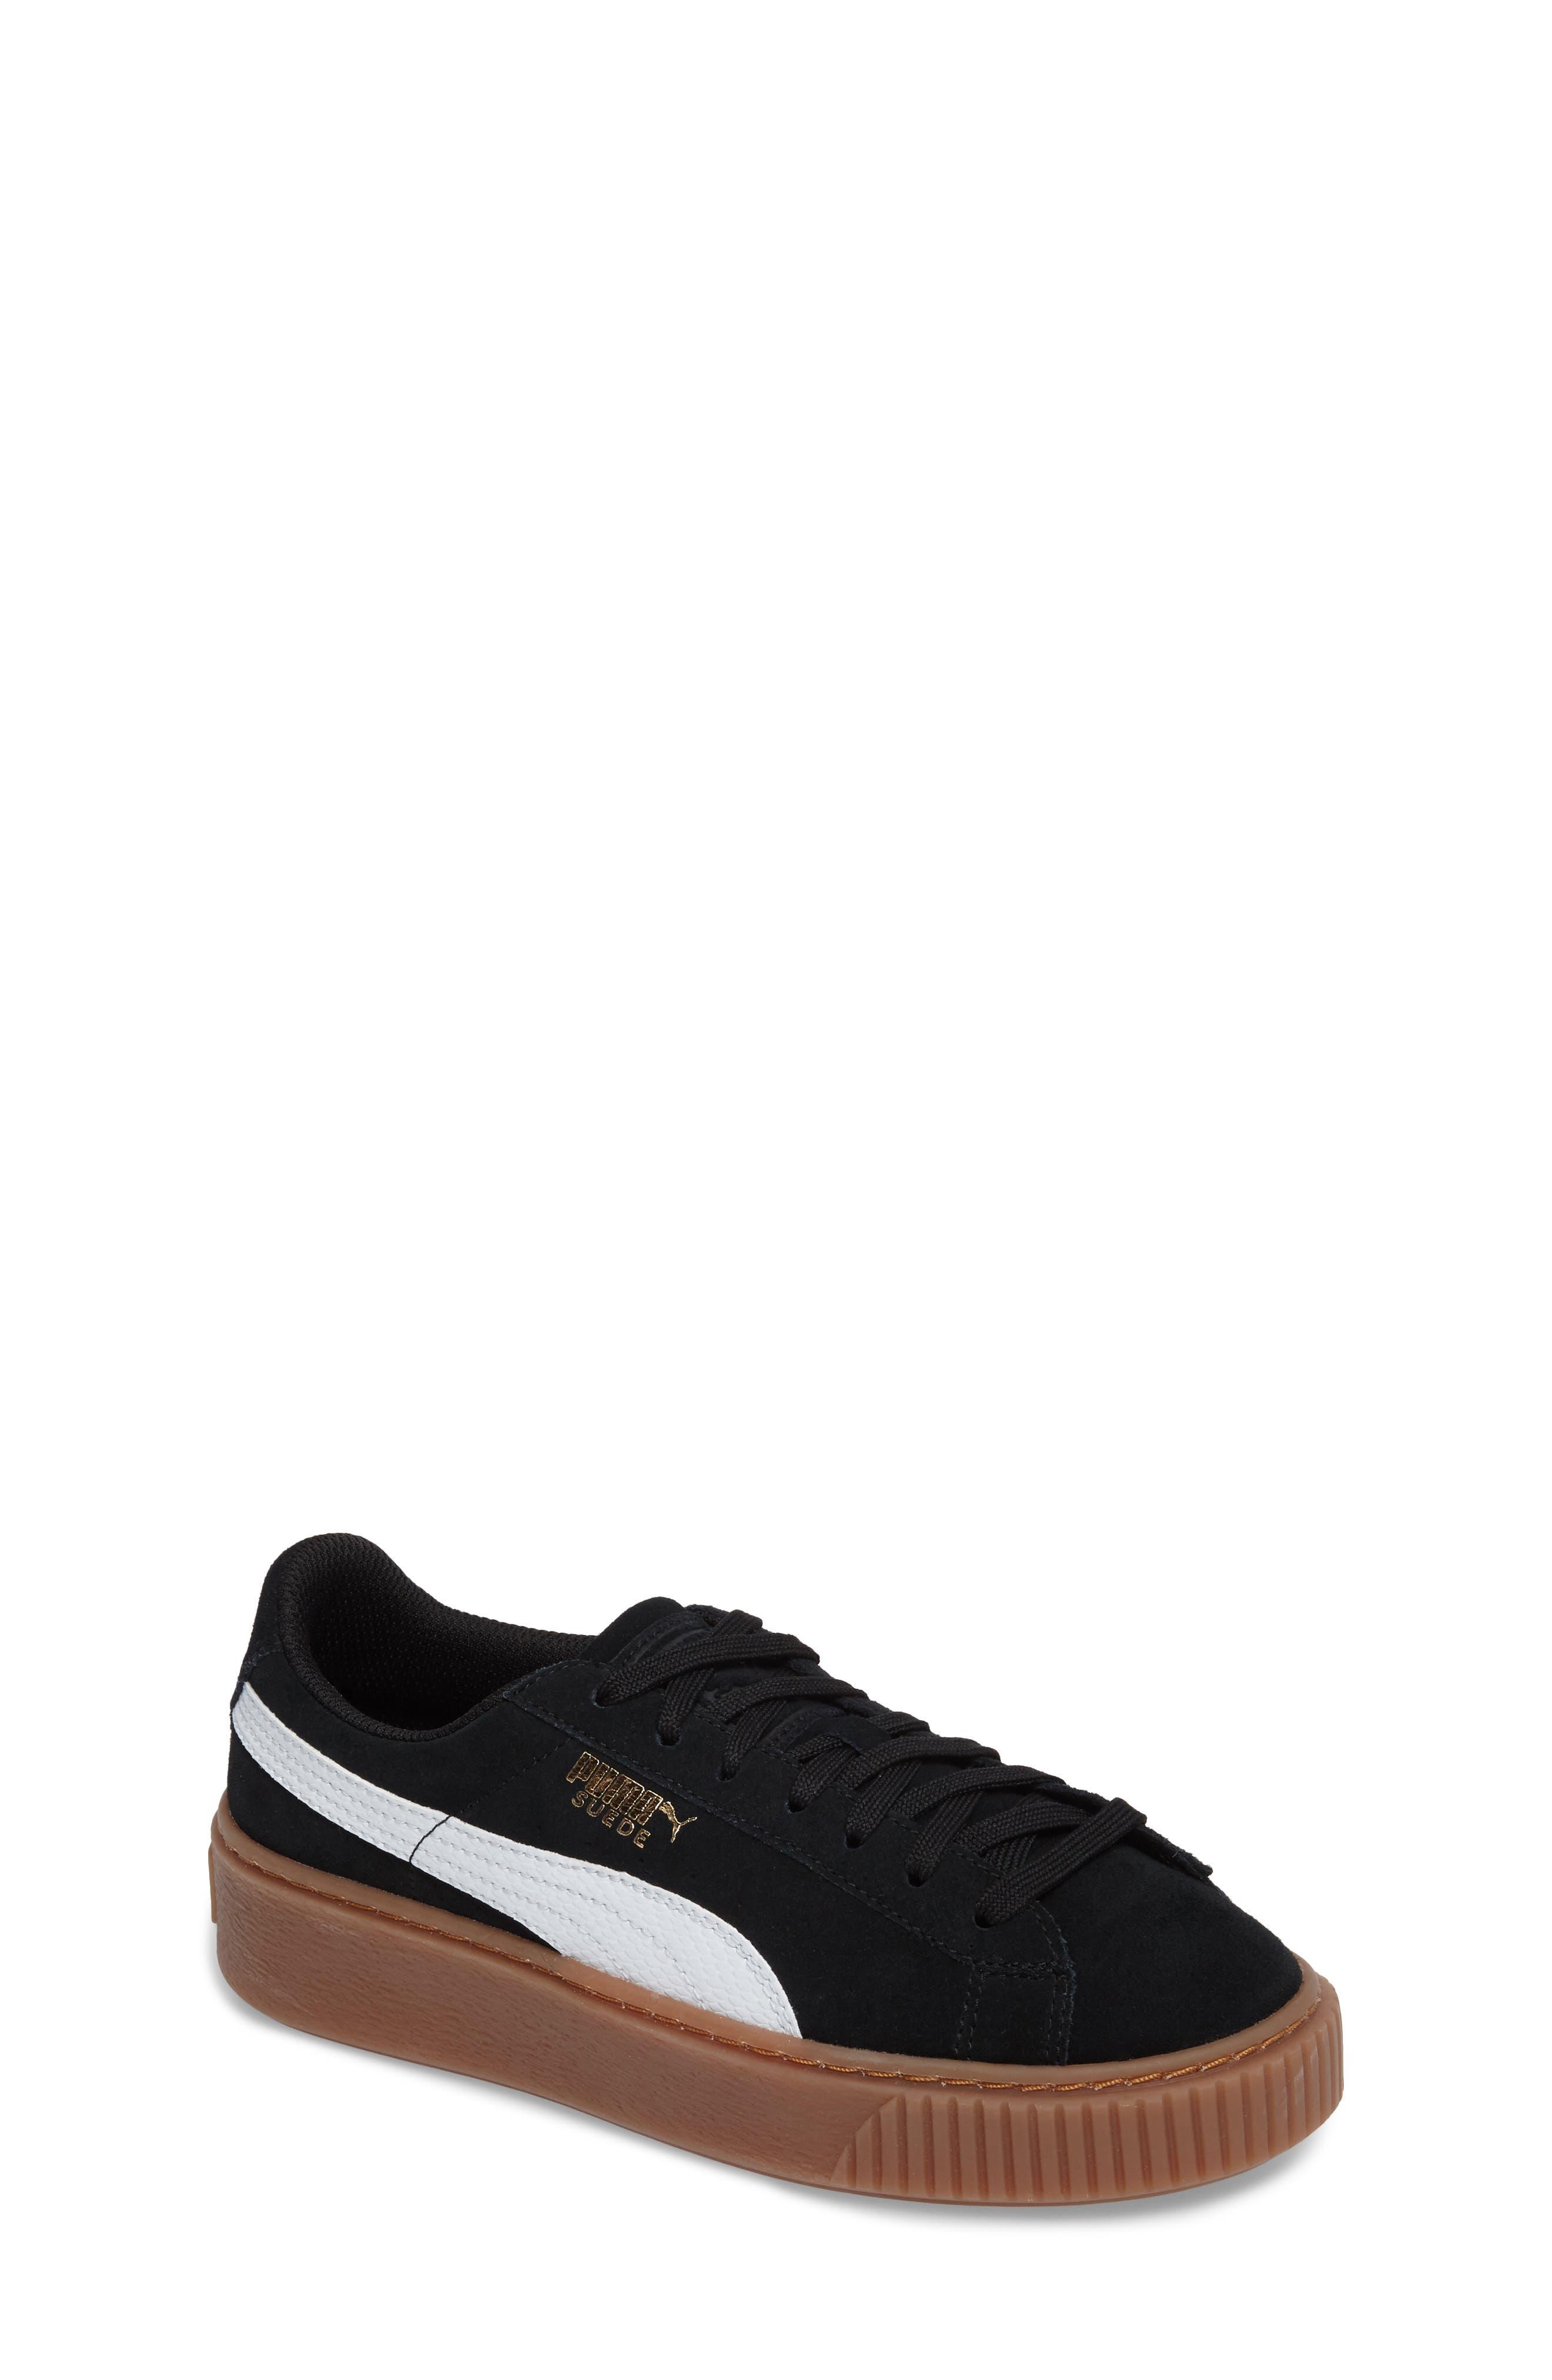 Main Image - PUMA Suede Platform Jr Sneaker (Big Kid)